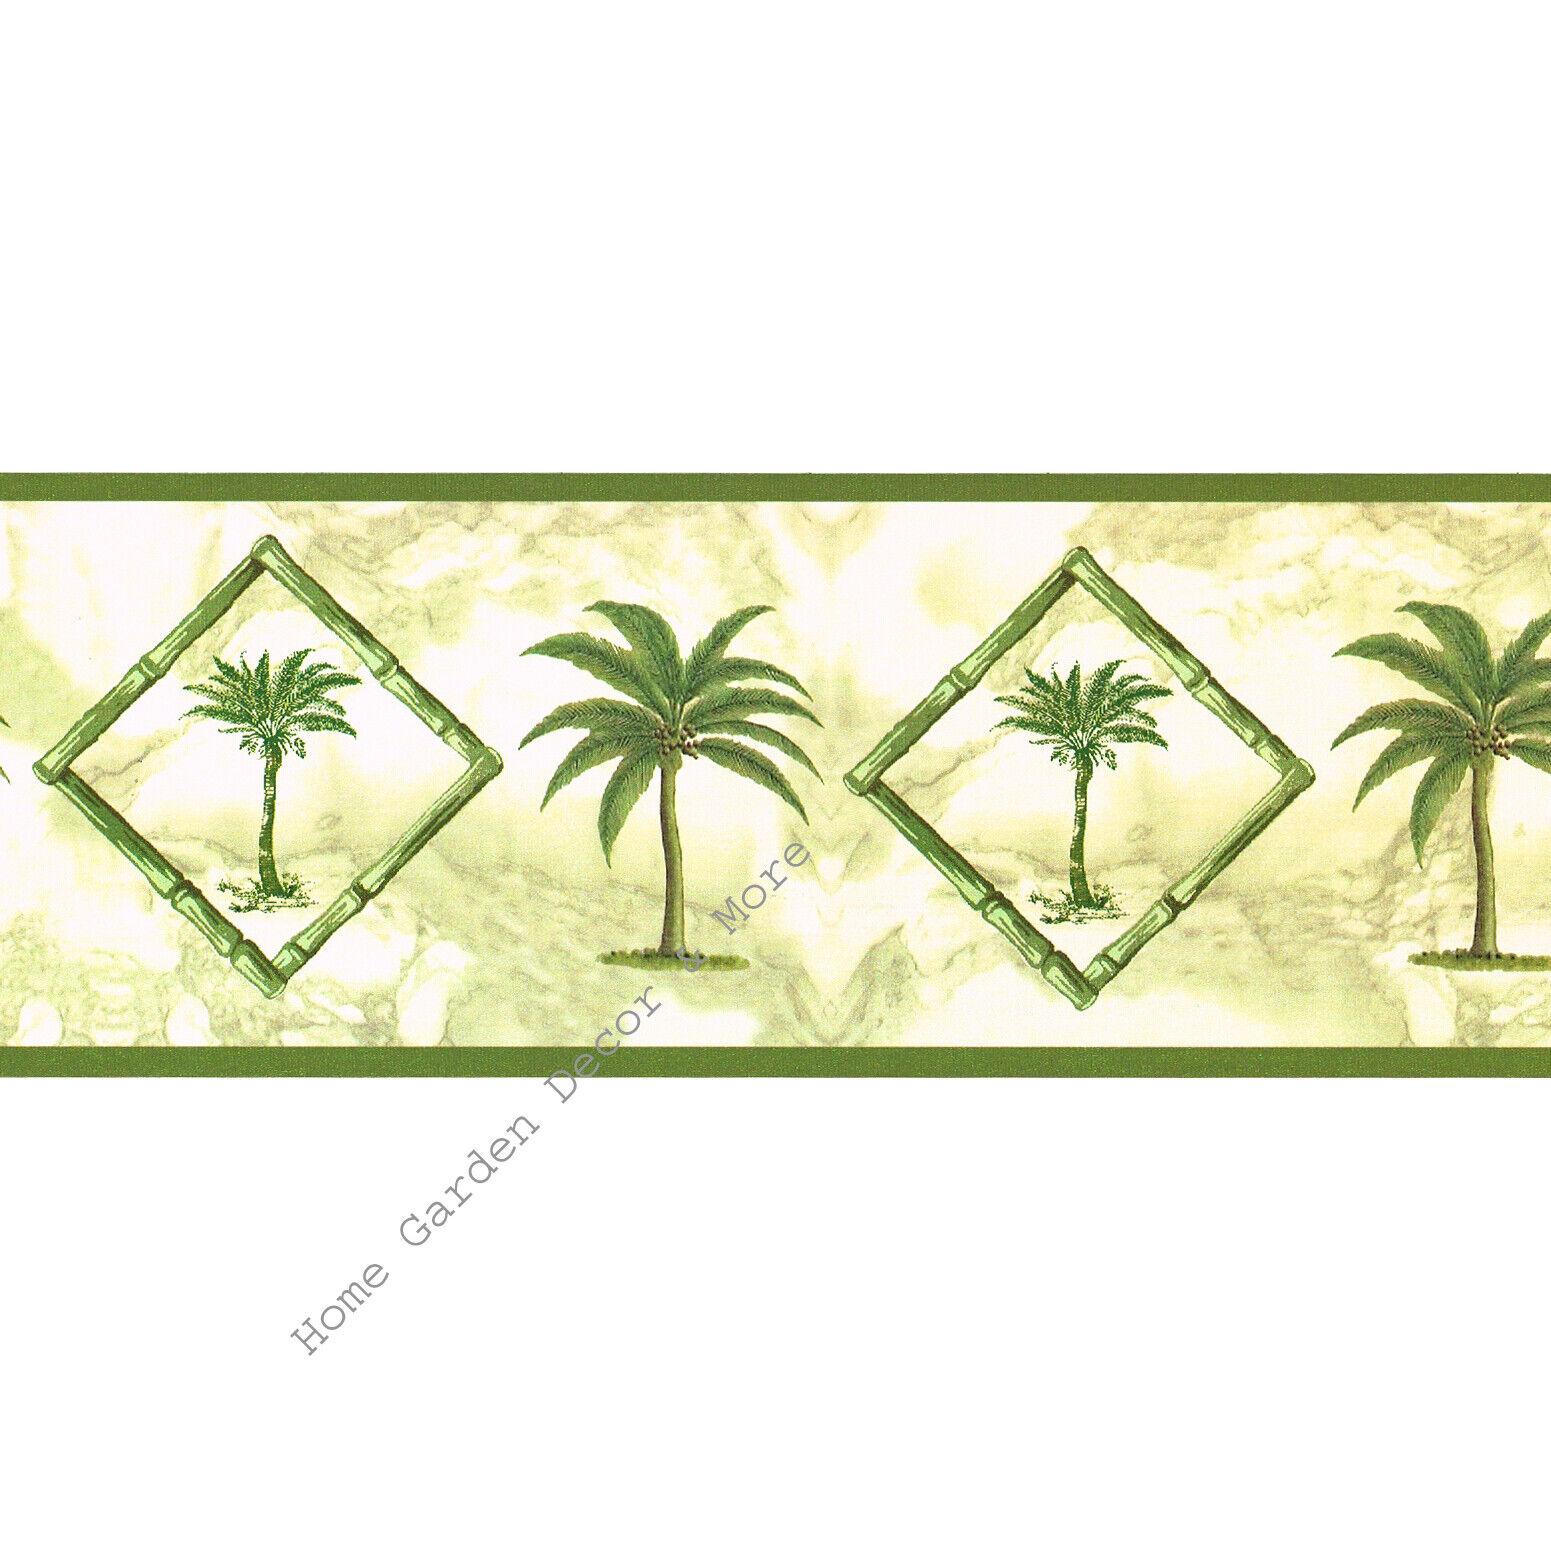 Coconuts on Palm Trees Latte Beige HV6012B Wallpaper Border